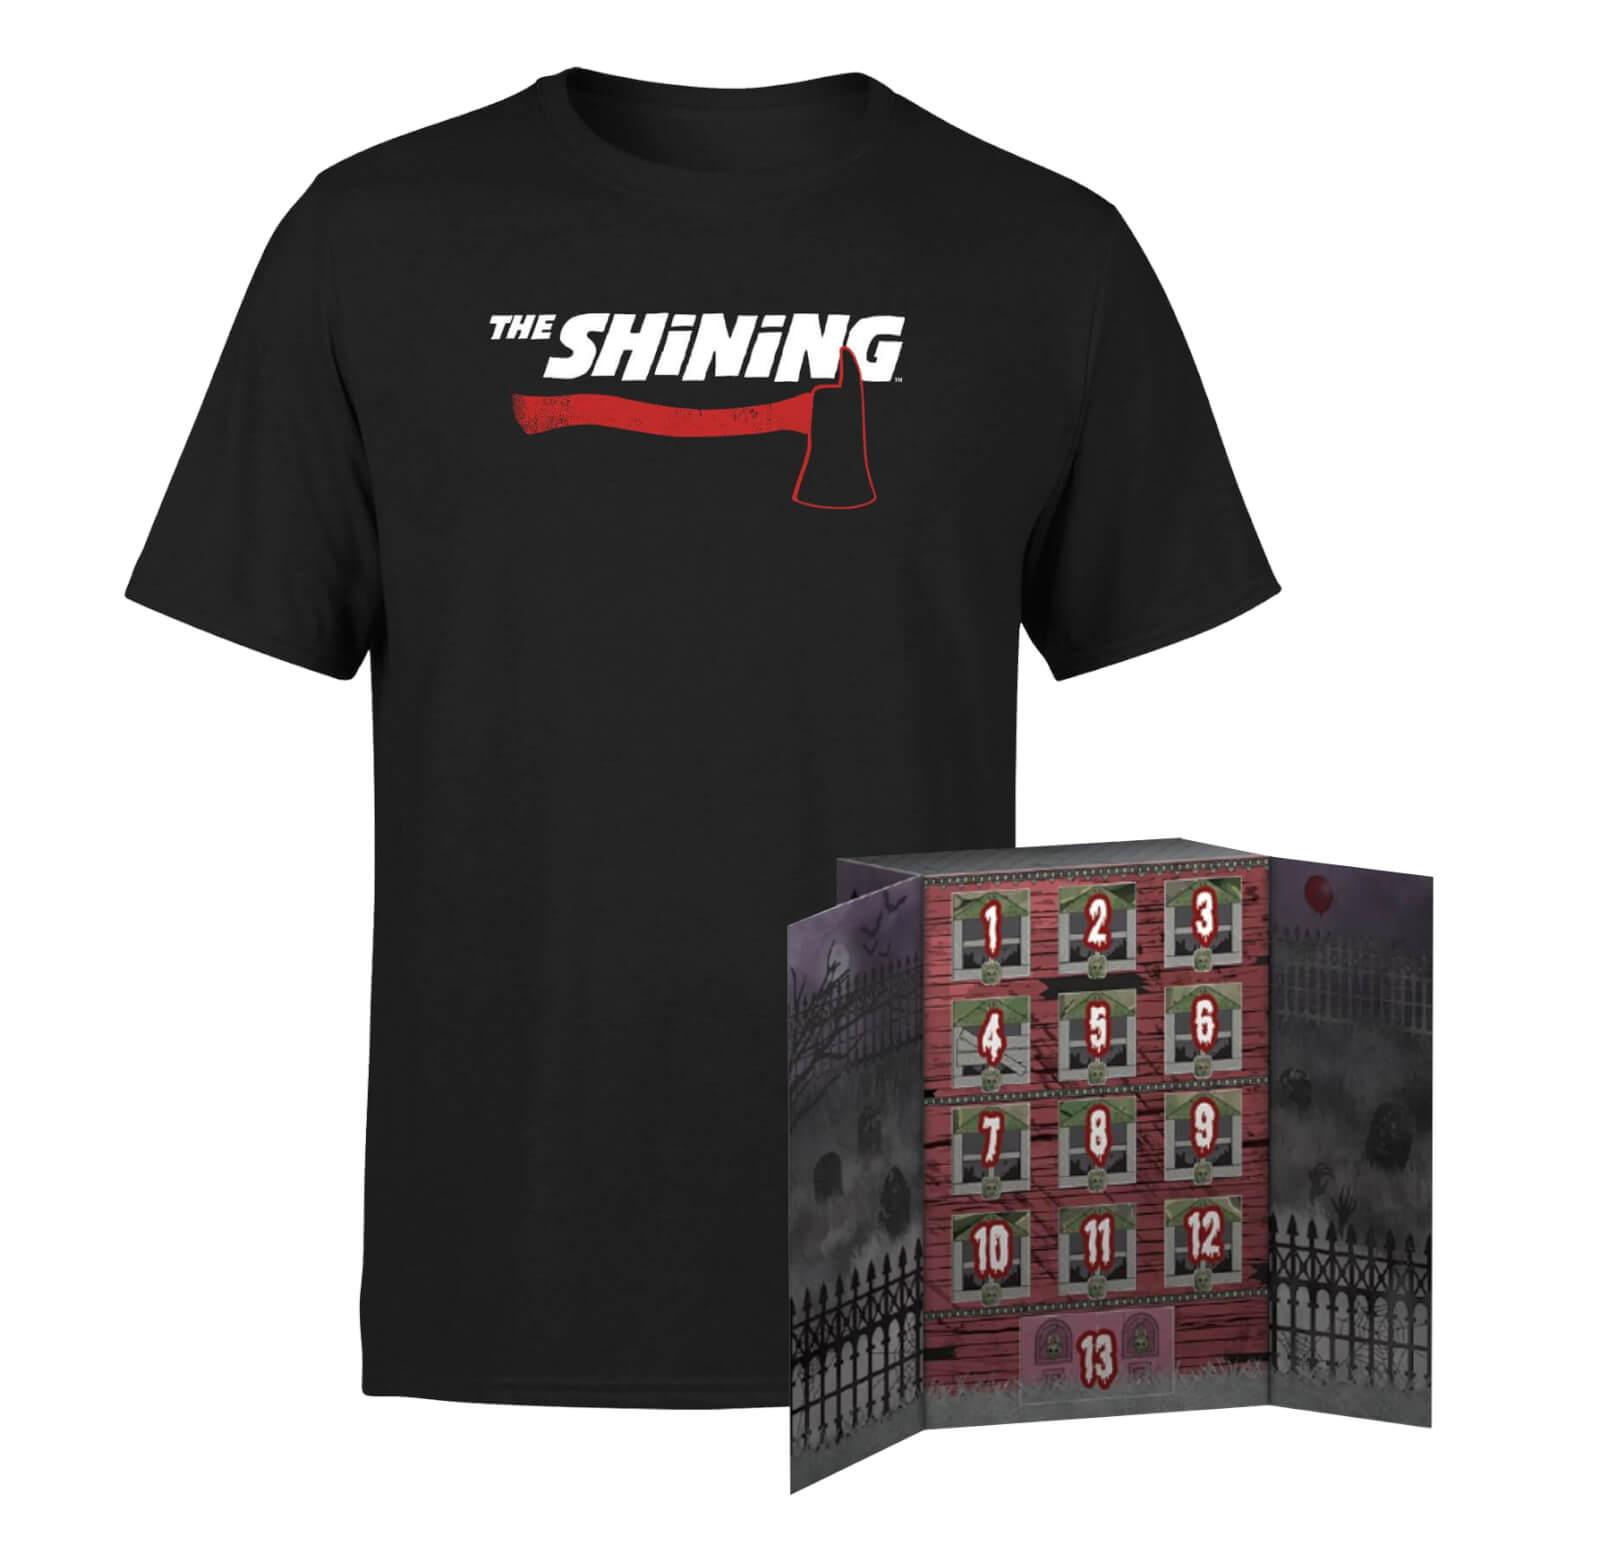 Lot Calendrier Funko pop! 13 Jours Halloween + T-Shirt The Shining